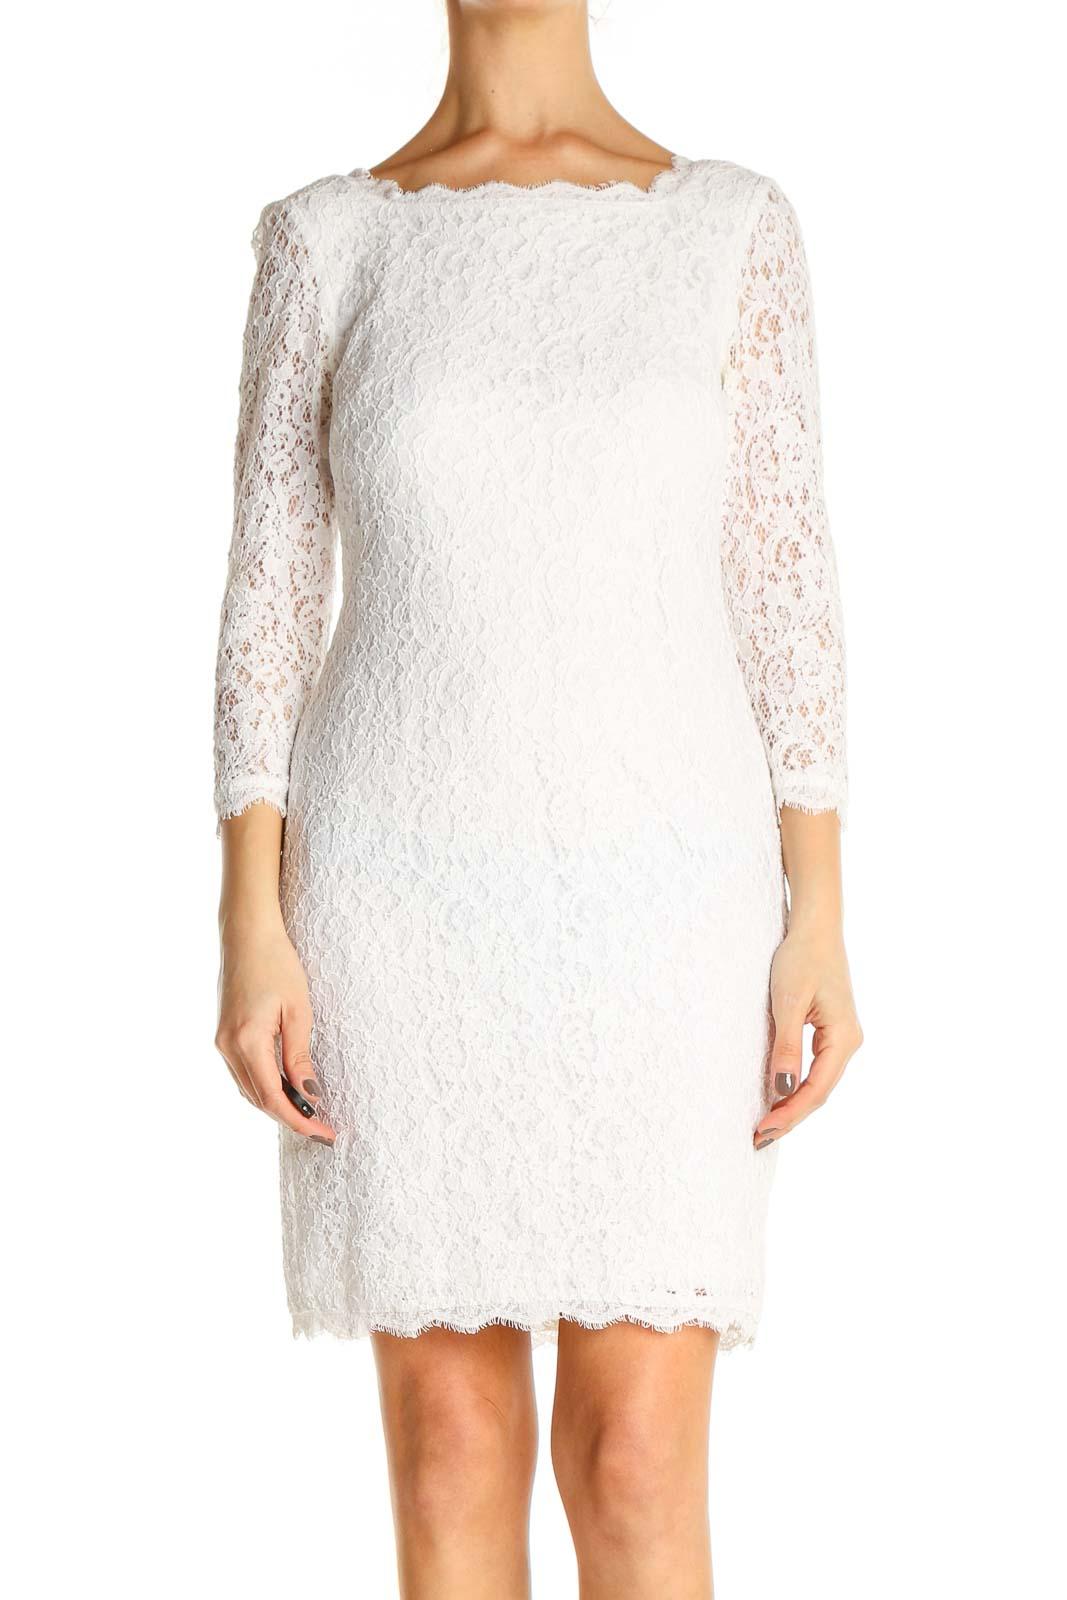 White Lace Classic Sheath Dress Front